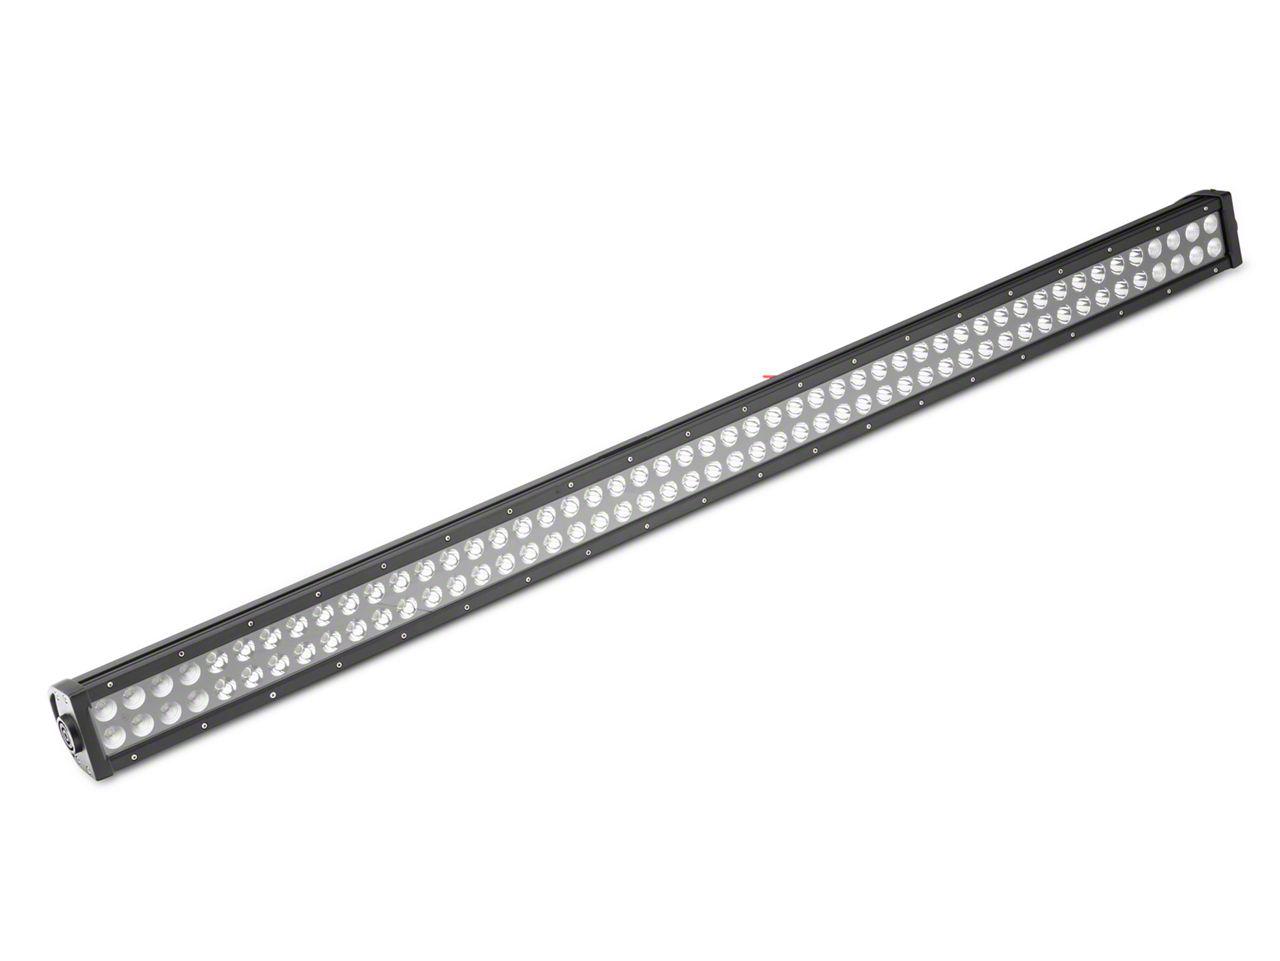 DV8 Off-Road 50 in. BRS Pro Series LED Light Bar - Flood/Spot Combo